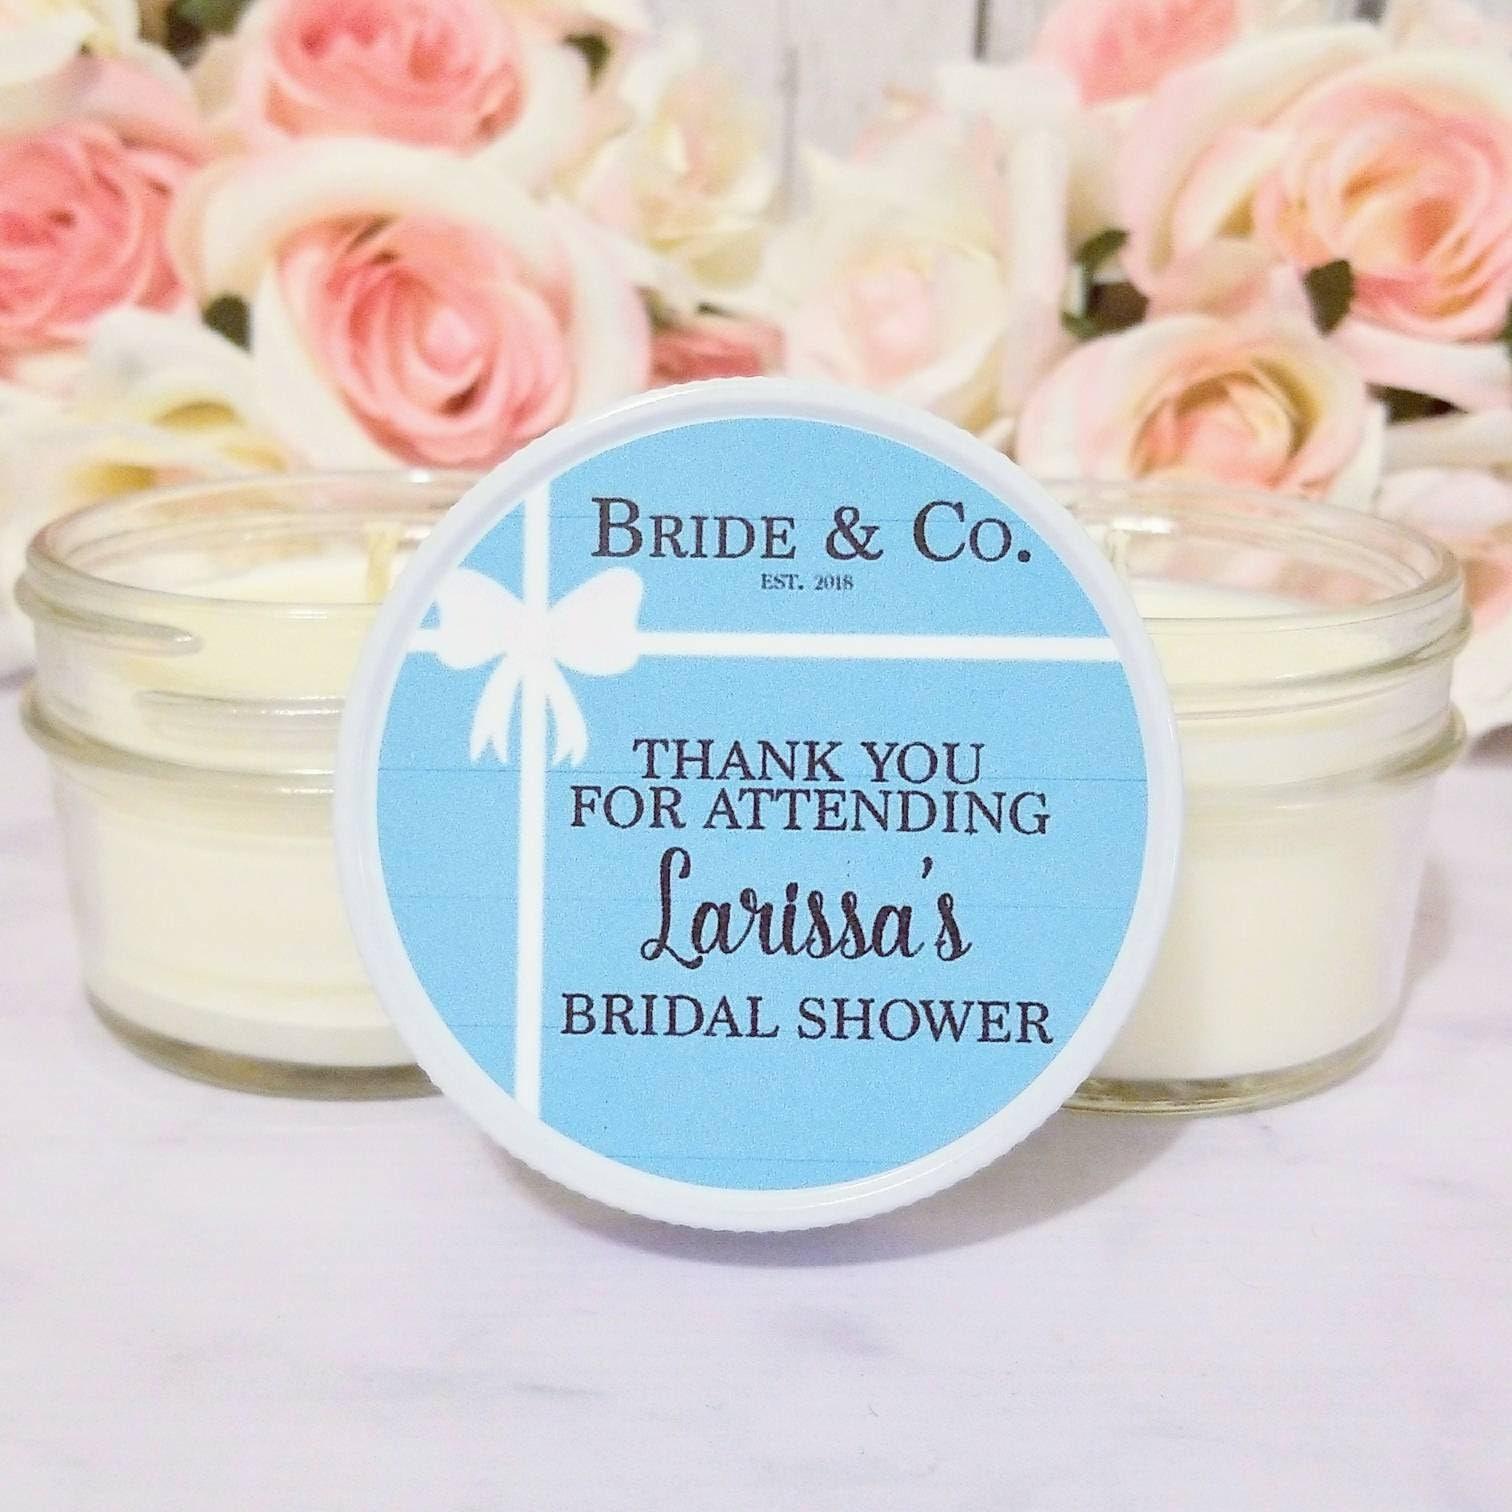 Bridal Shower Candle Favors Bride and Co Bridal Shower | Etsy